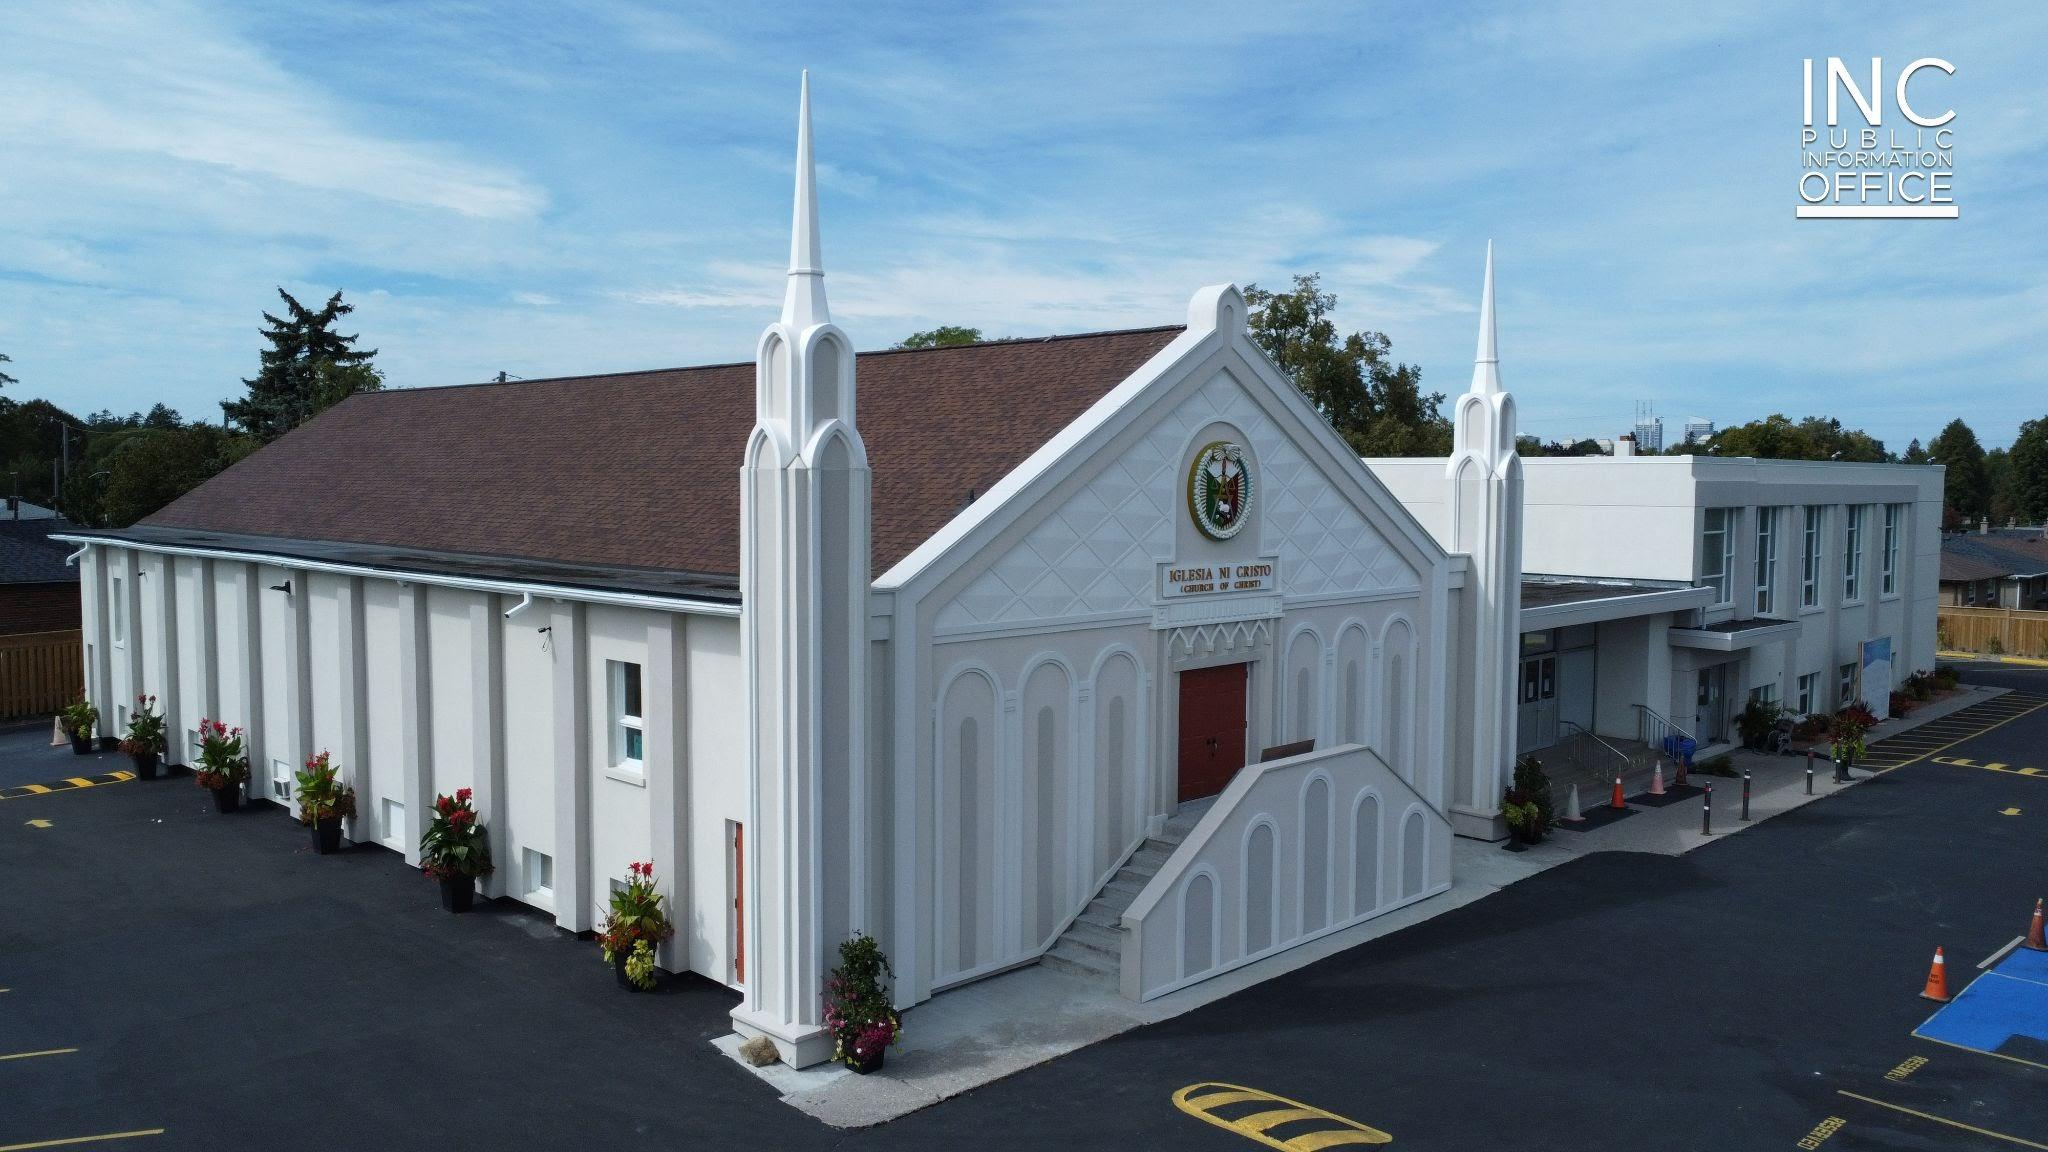 Iglesia Ni Cristo (INC) completes renovation, rededicates worship building in Scarborough, Ontario amid pandemic